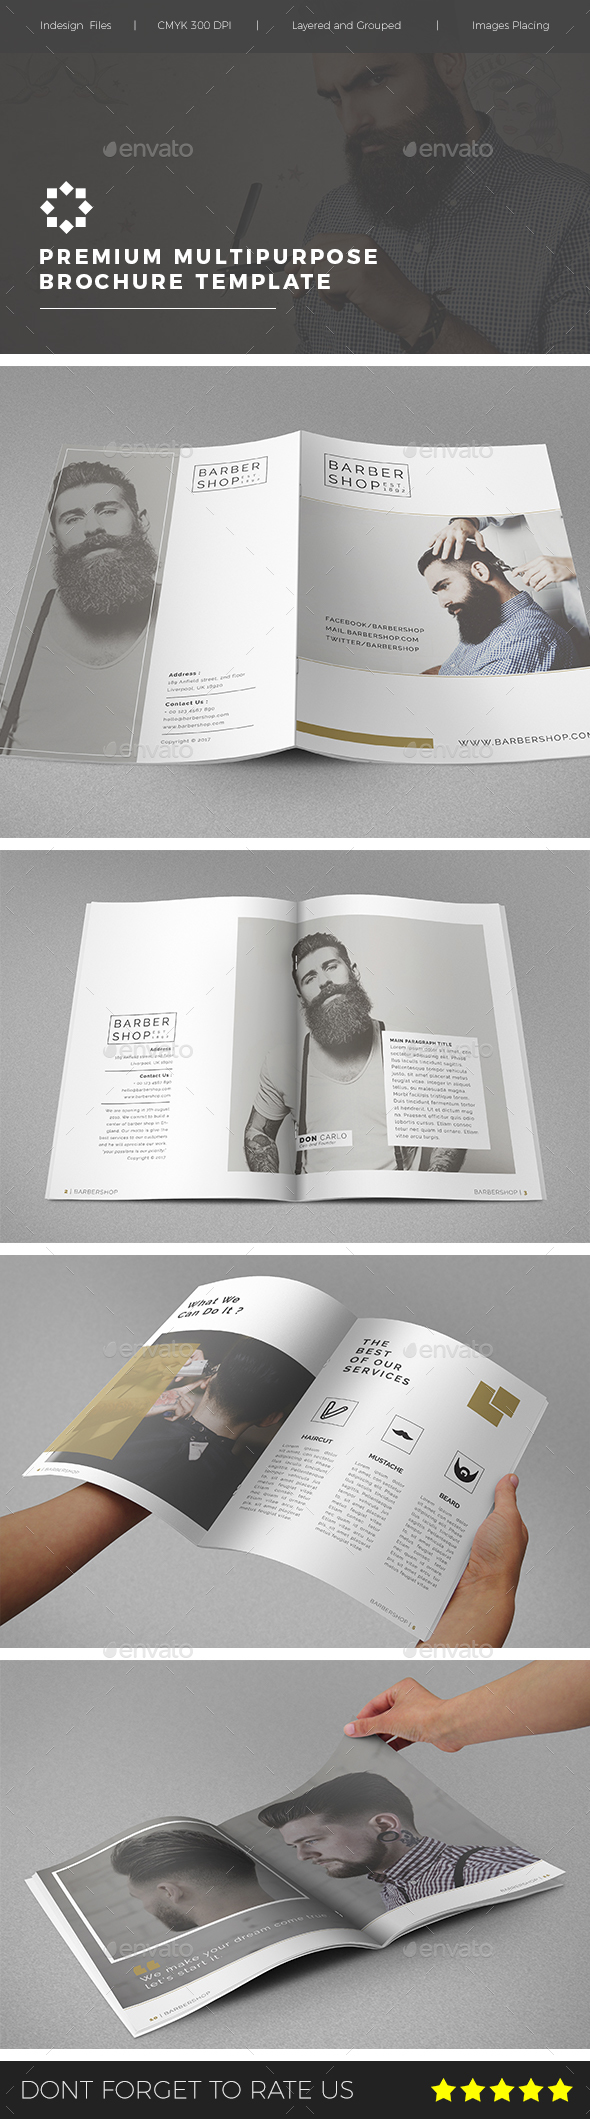 Multipurpose Barbershop Brochure - Brochures Print Templates